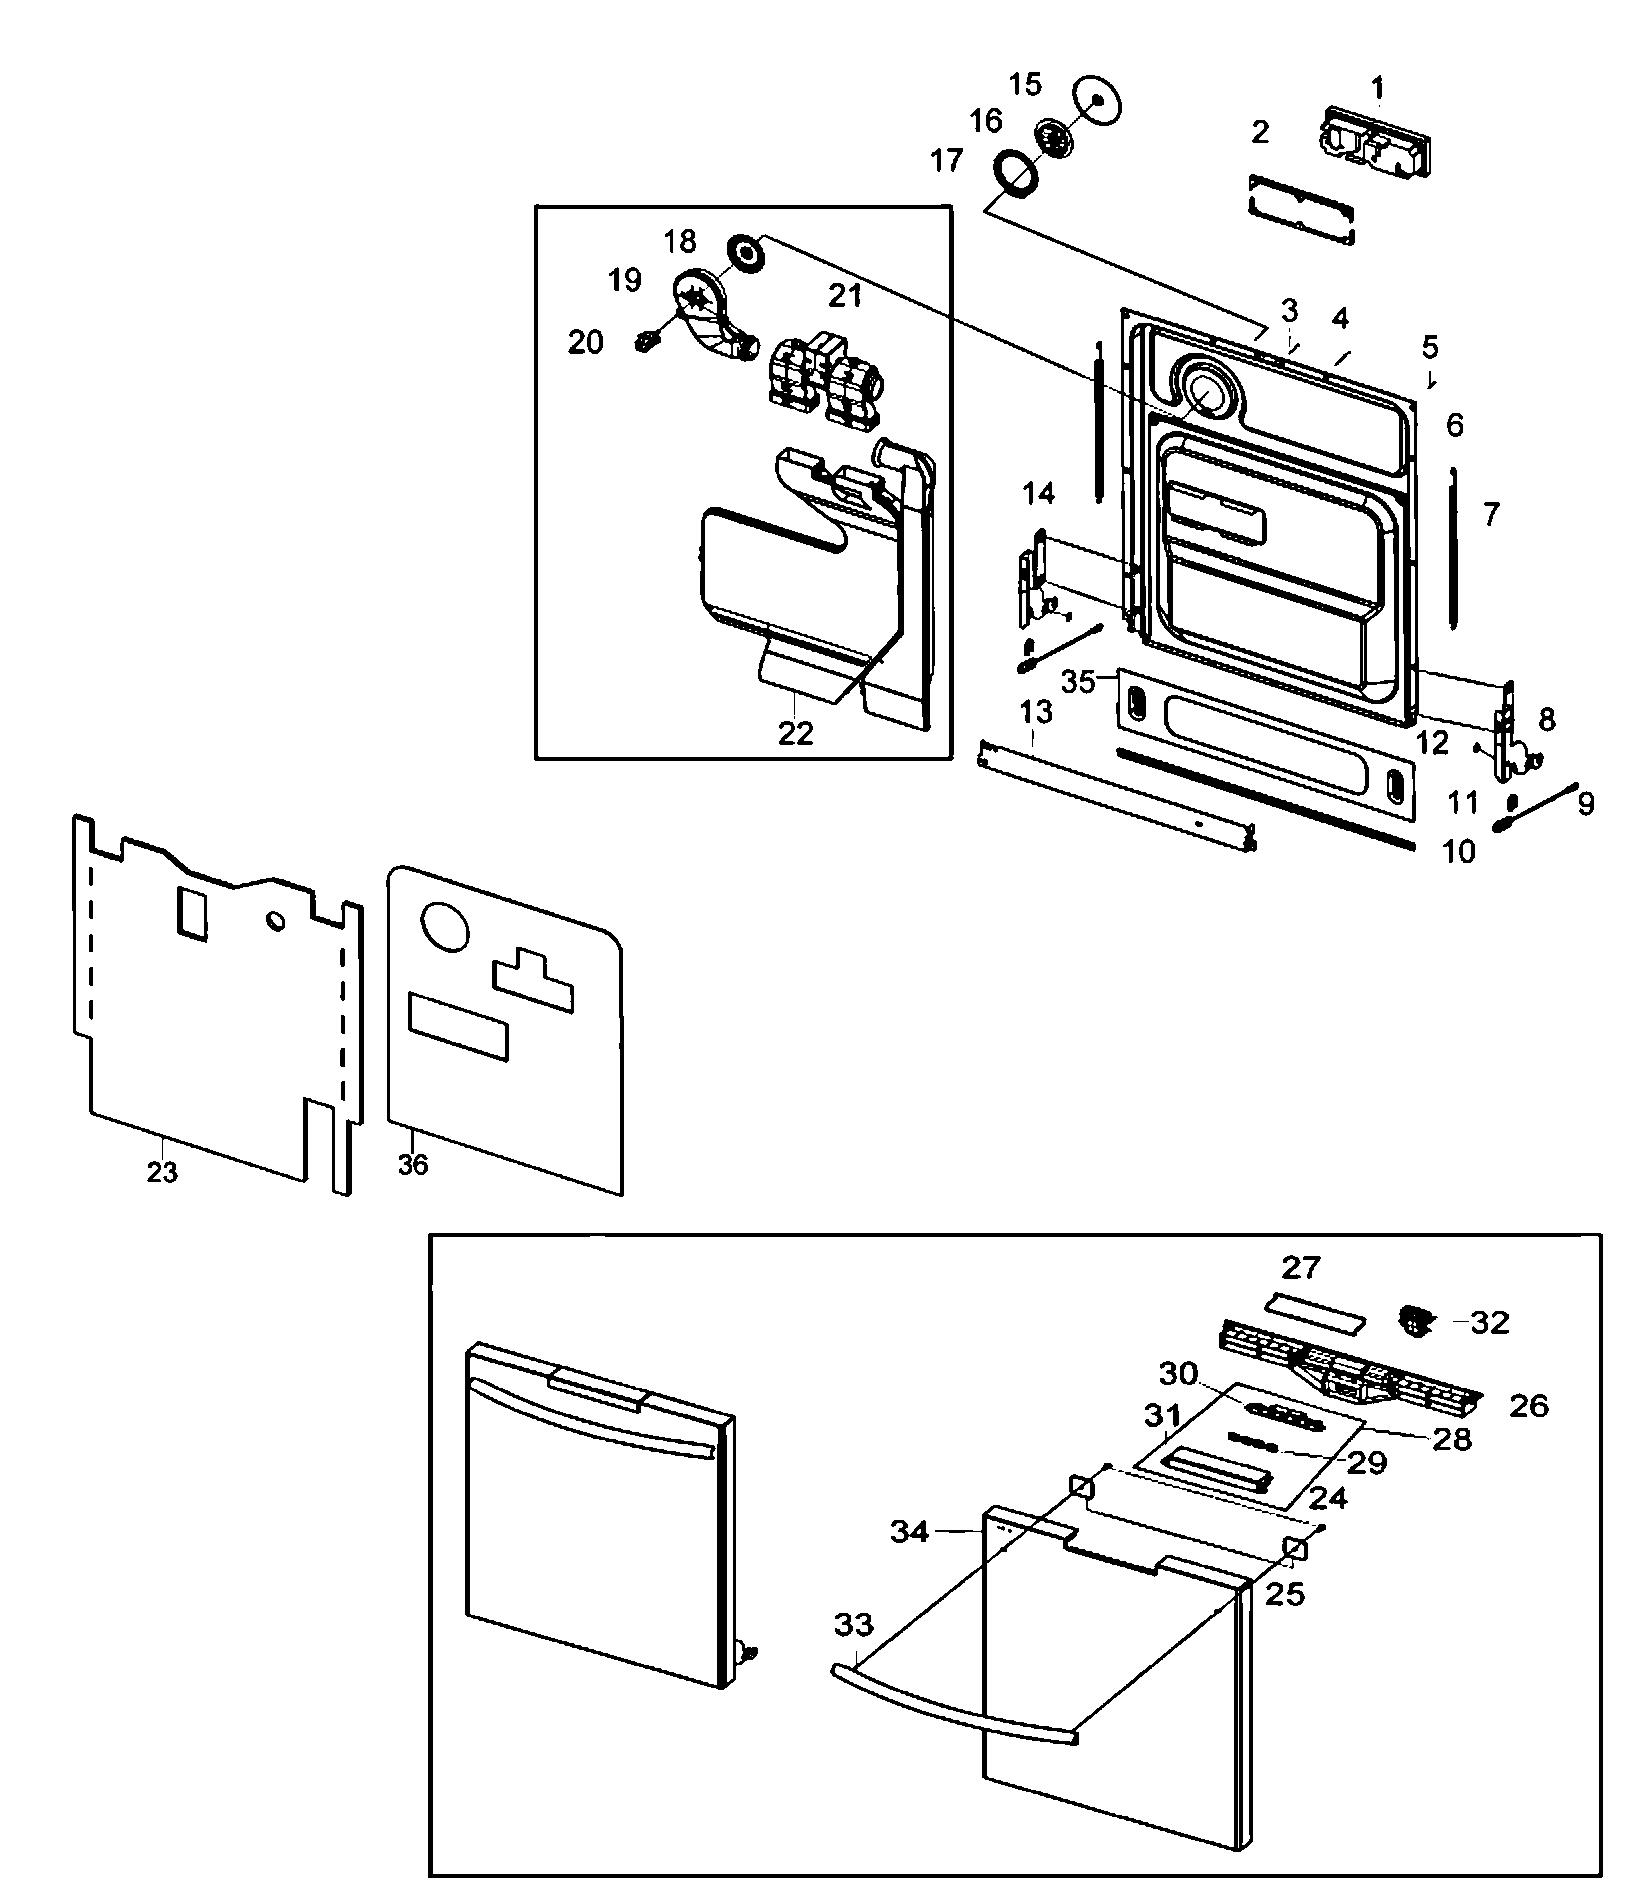 Samsung model DMT800RHS/XAA dishwasher genuine parts